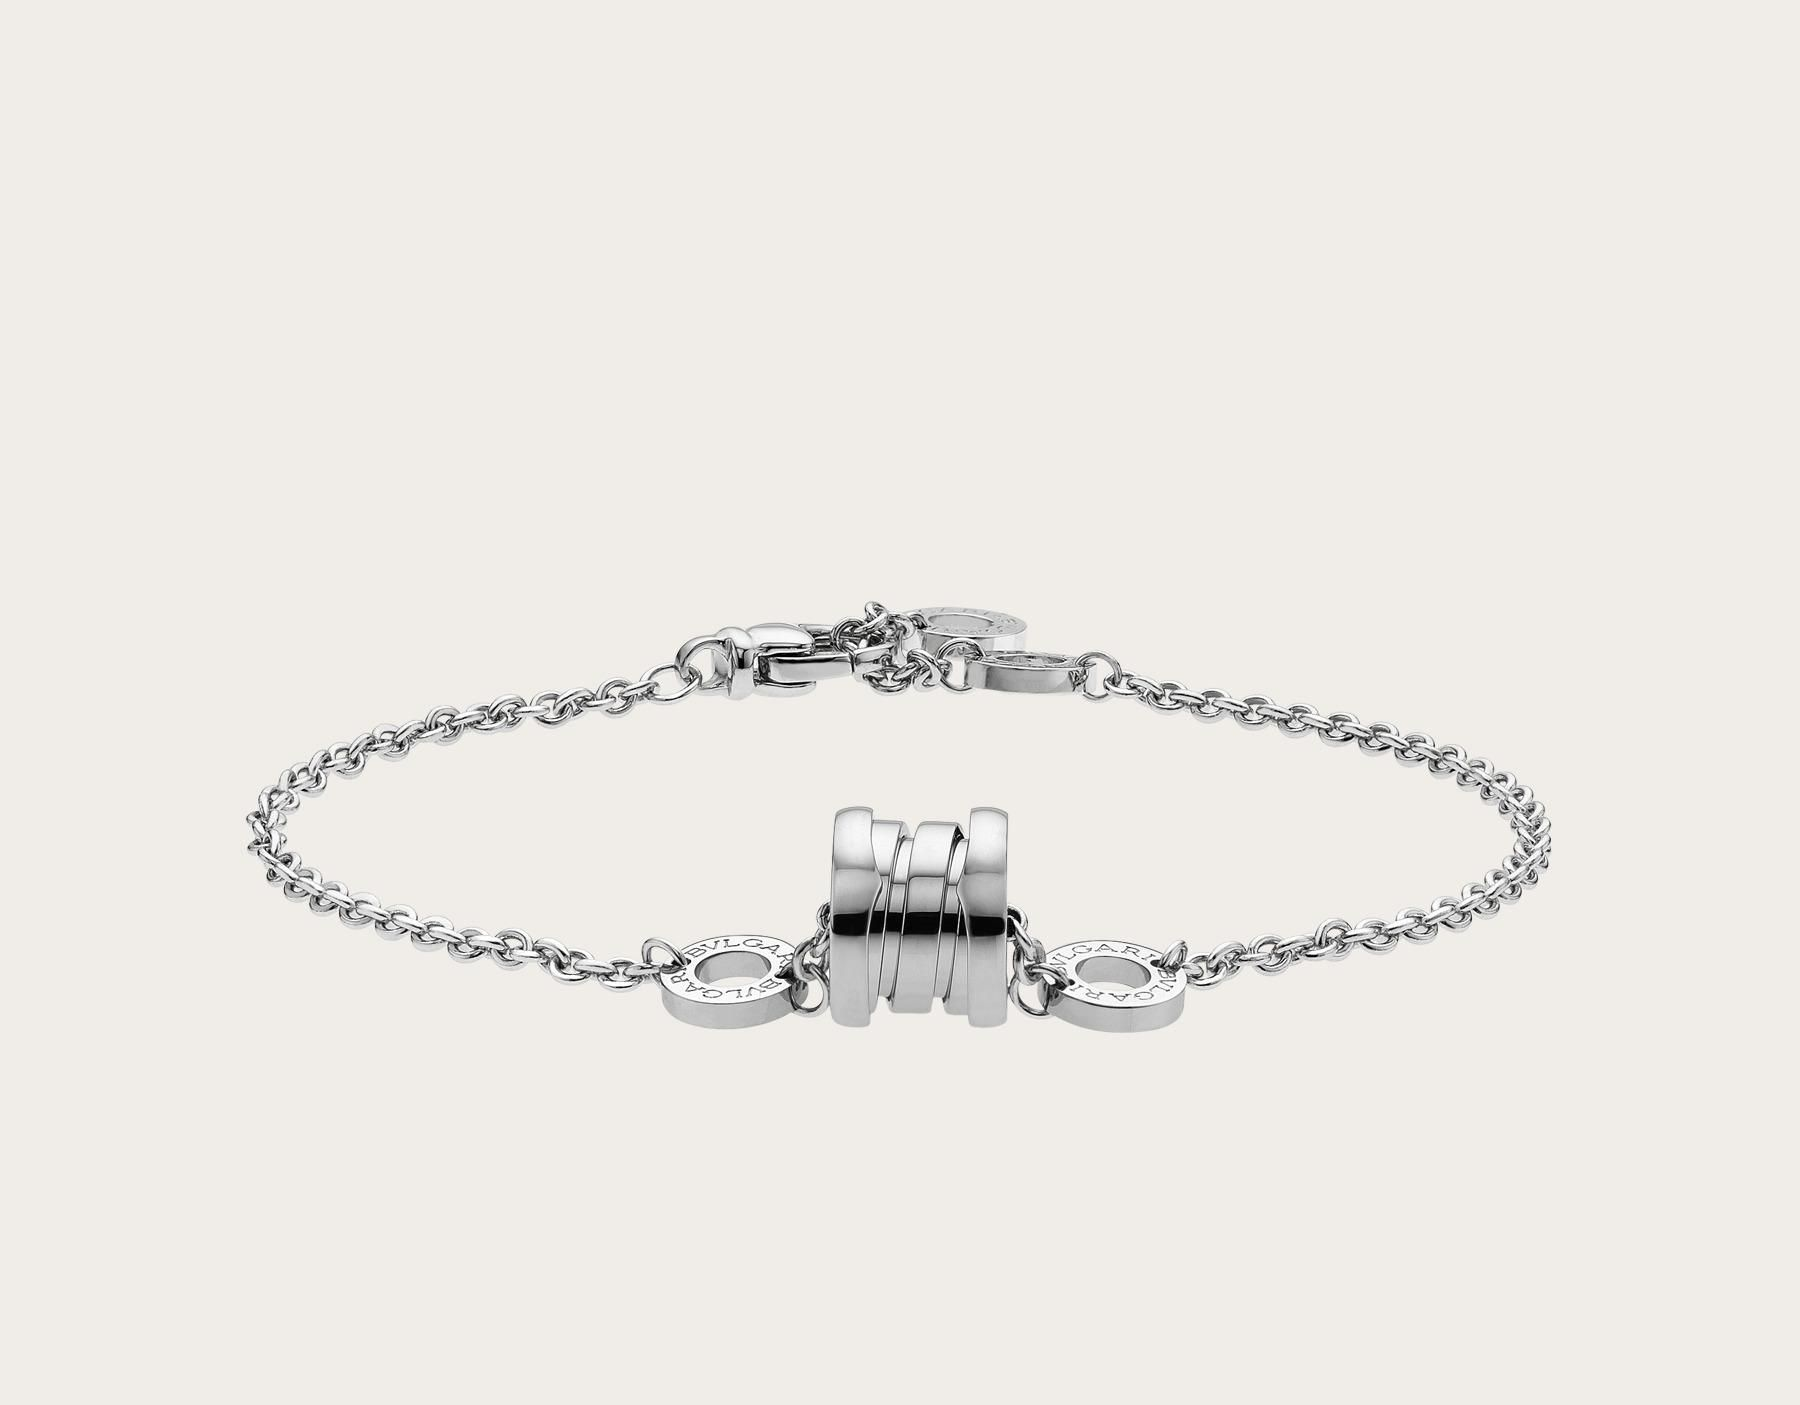 e7649c5c4ad2b Photo number 1: B.zero1 soft bracelet in 18kt white gold. Stock Code ...